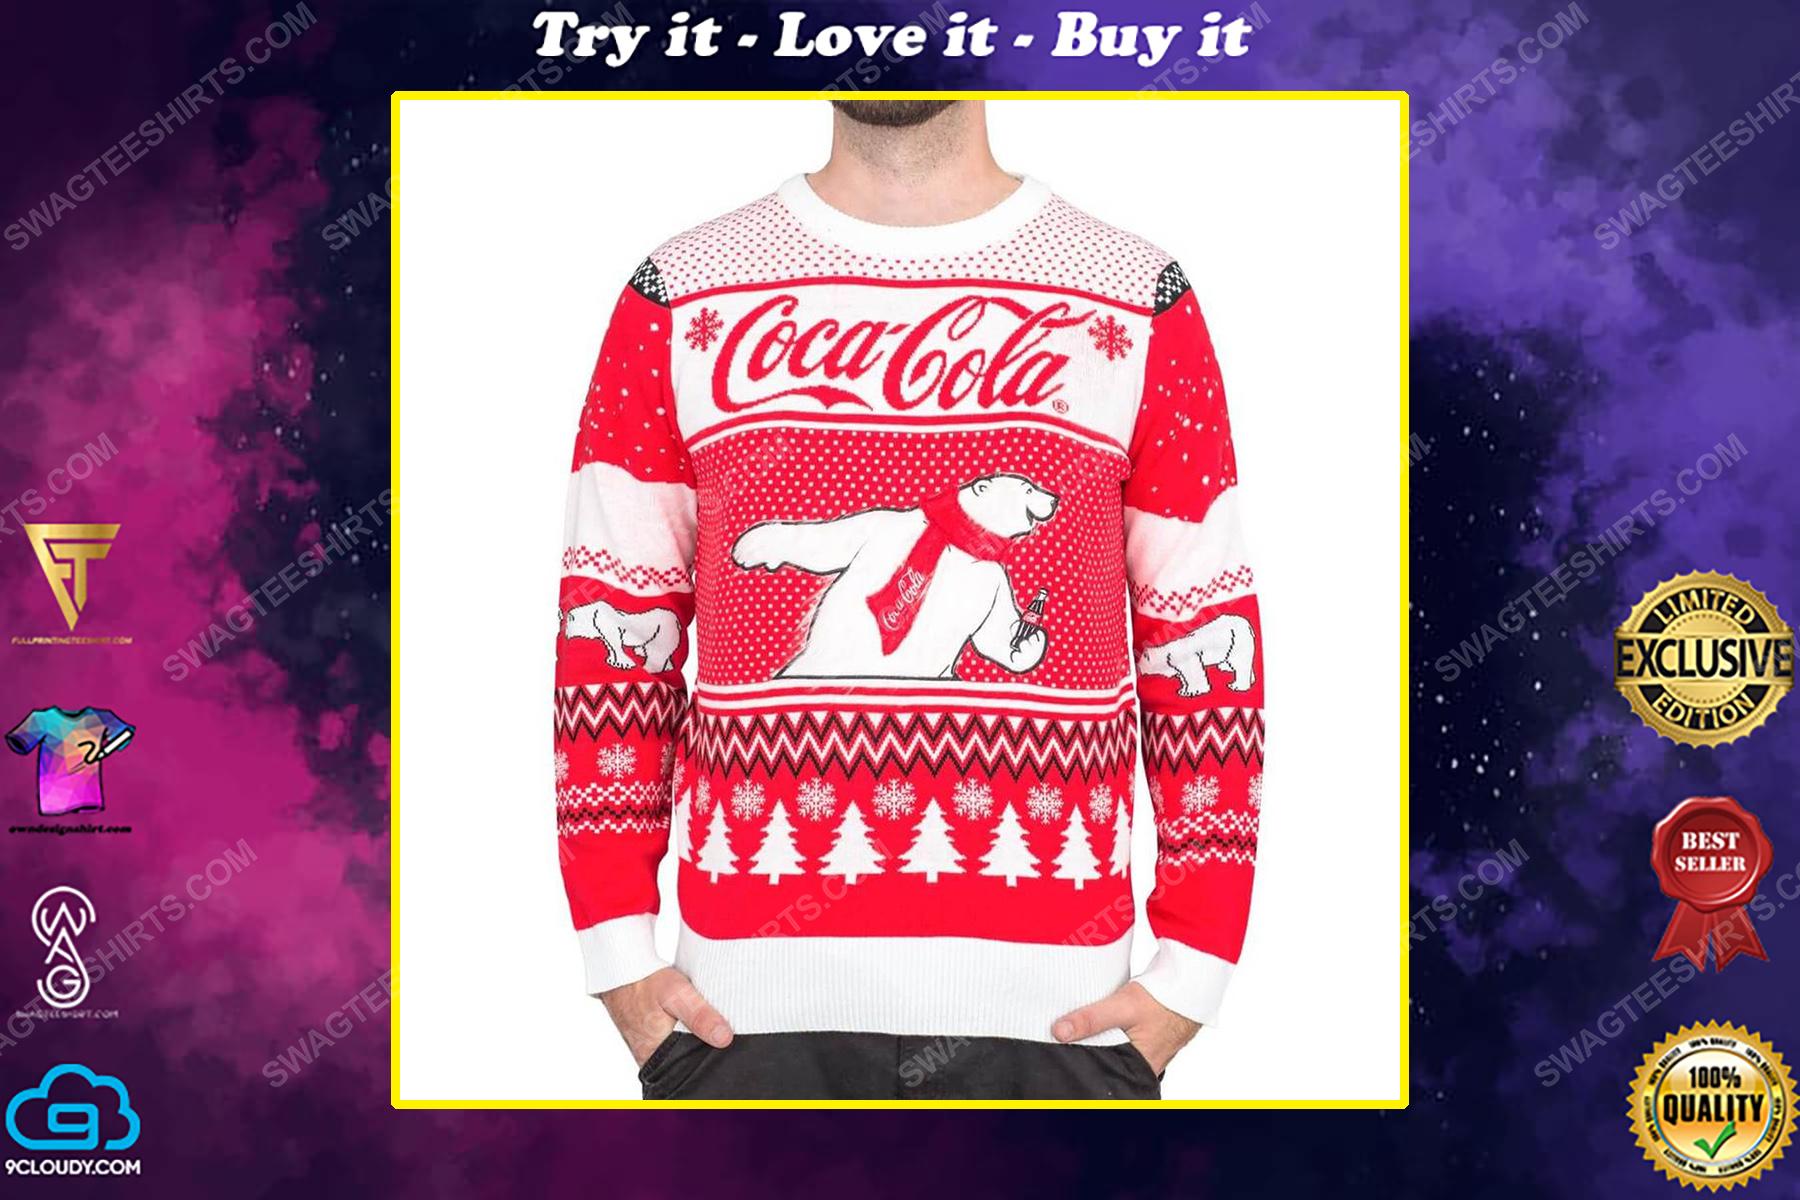 Coca-cola polar bear coke full print ugly christmas sweater